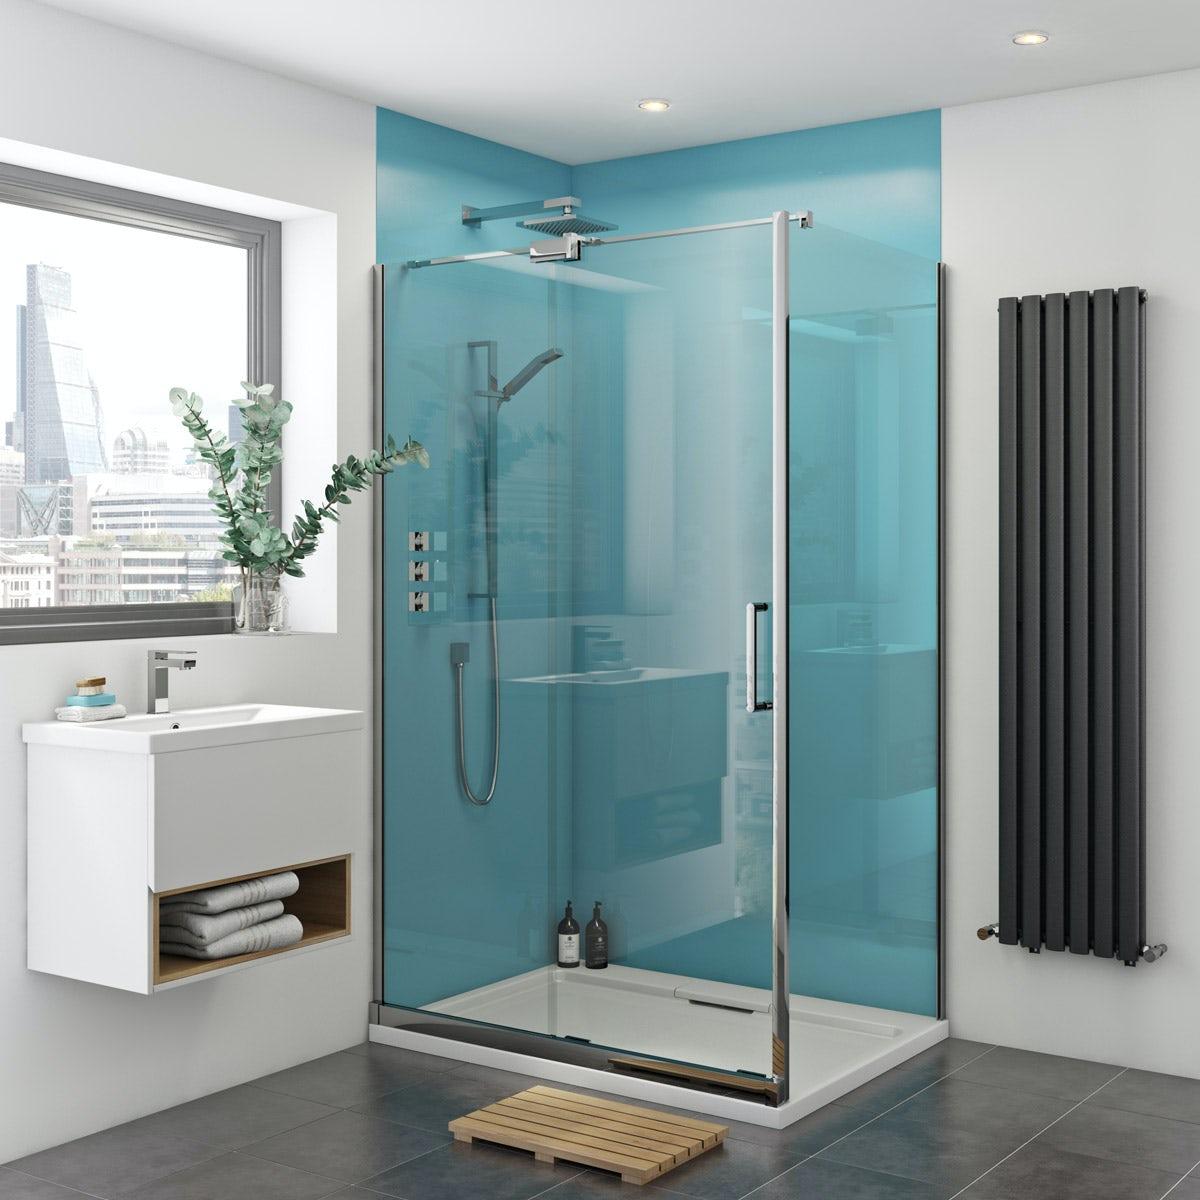 Acrylic Sheet Shower Wall